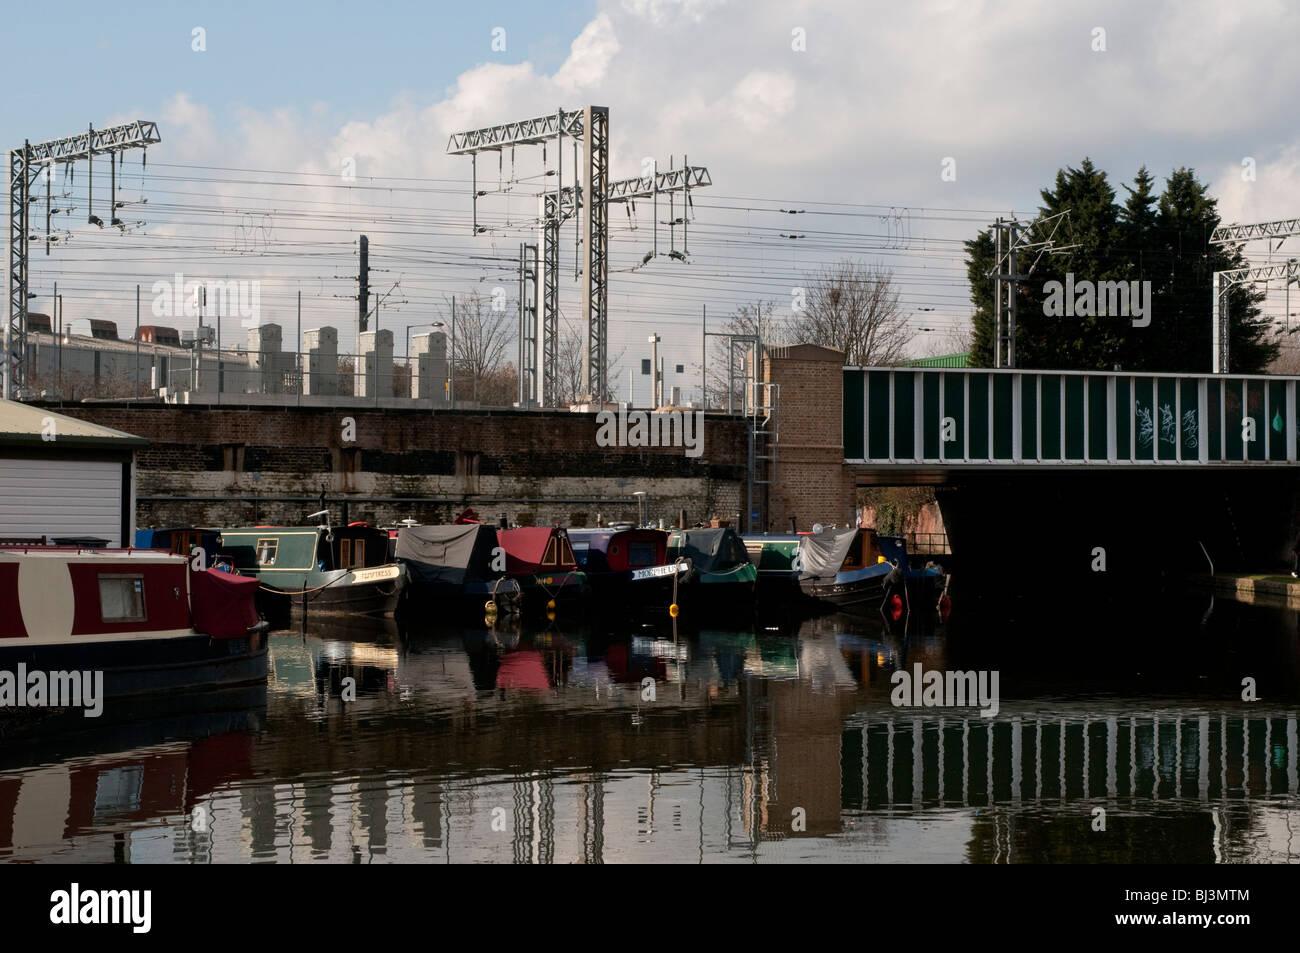 Boats on Regents Canal near the railway lines, Kings Cross, London, UK - Stock Image